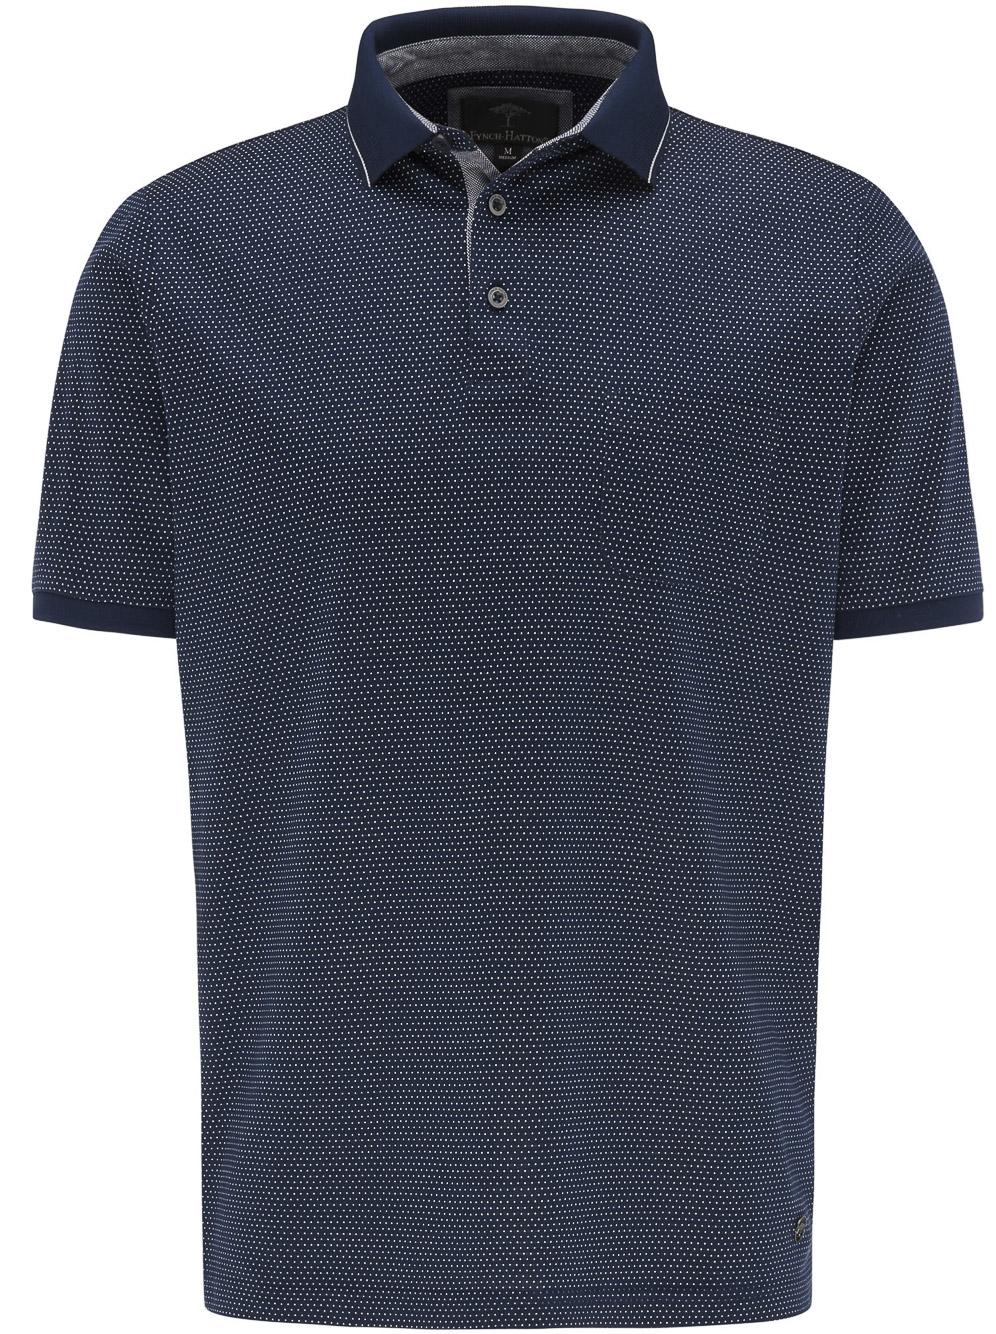 FYNCH-HATTON Μπλούζα Polo 1120 1784-1695 ΜΠΛΕ